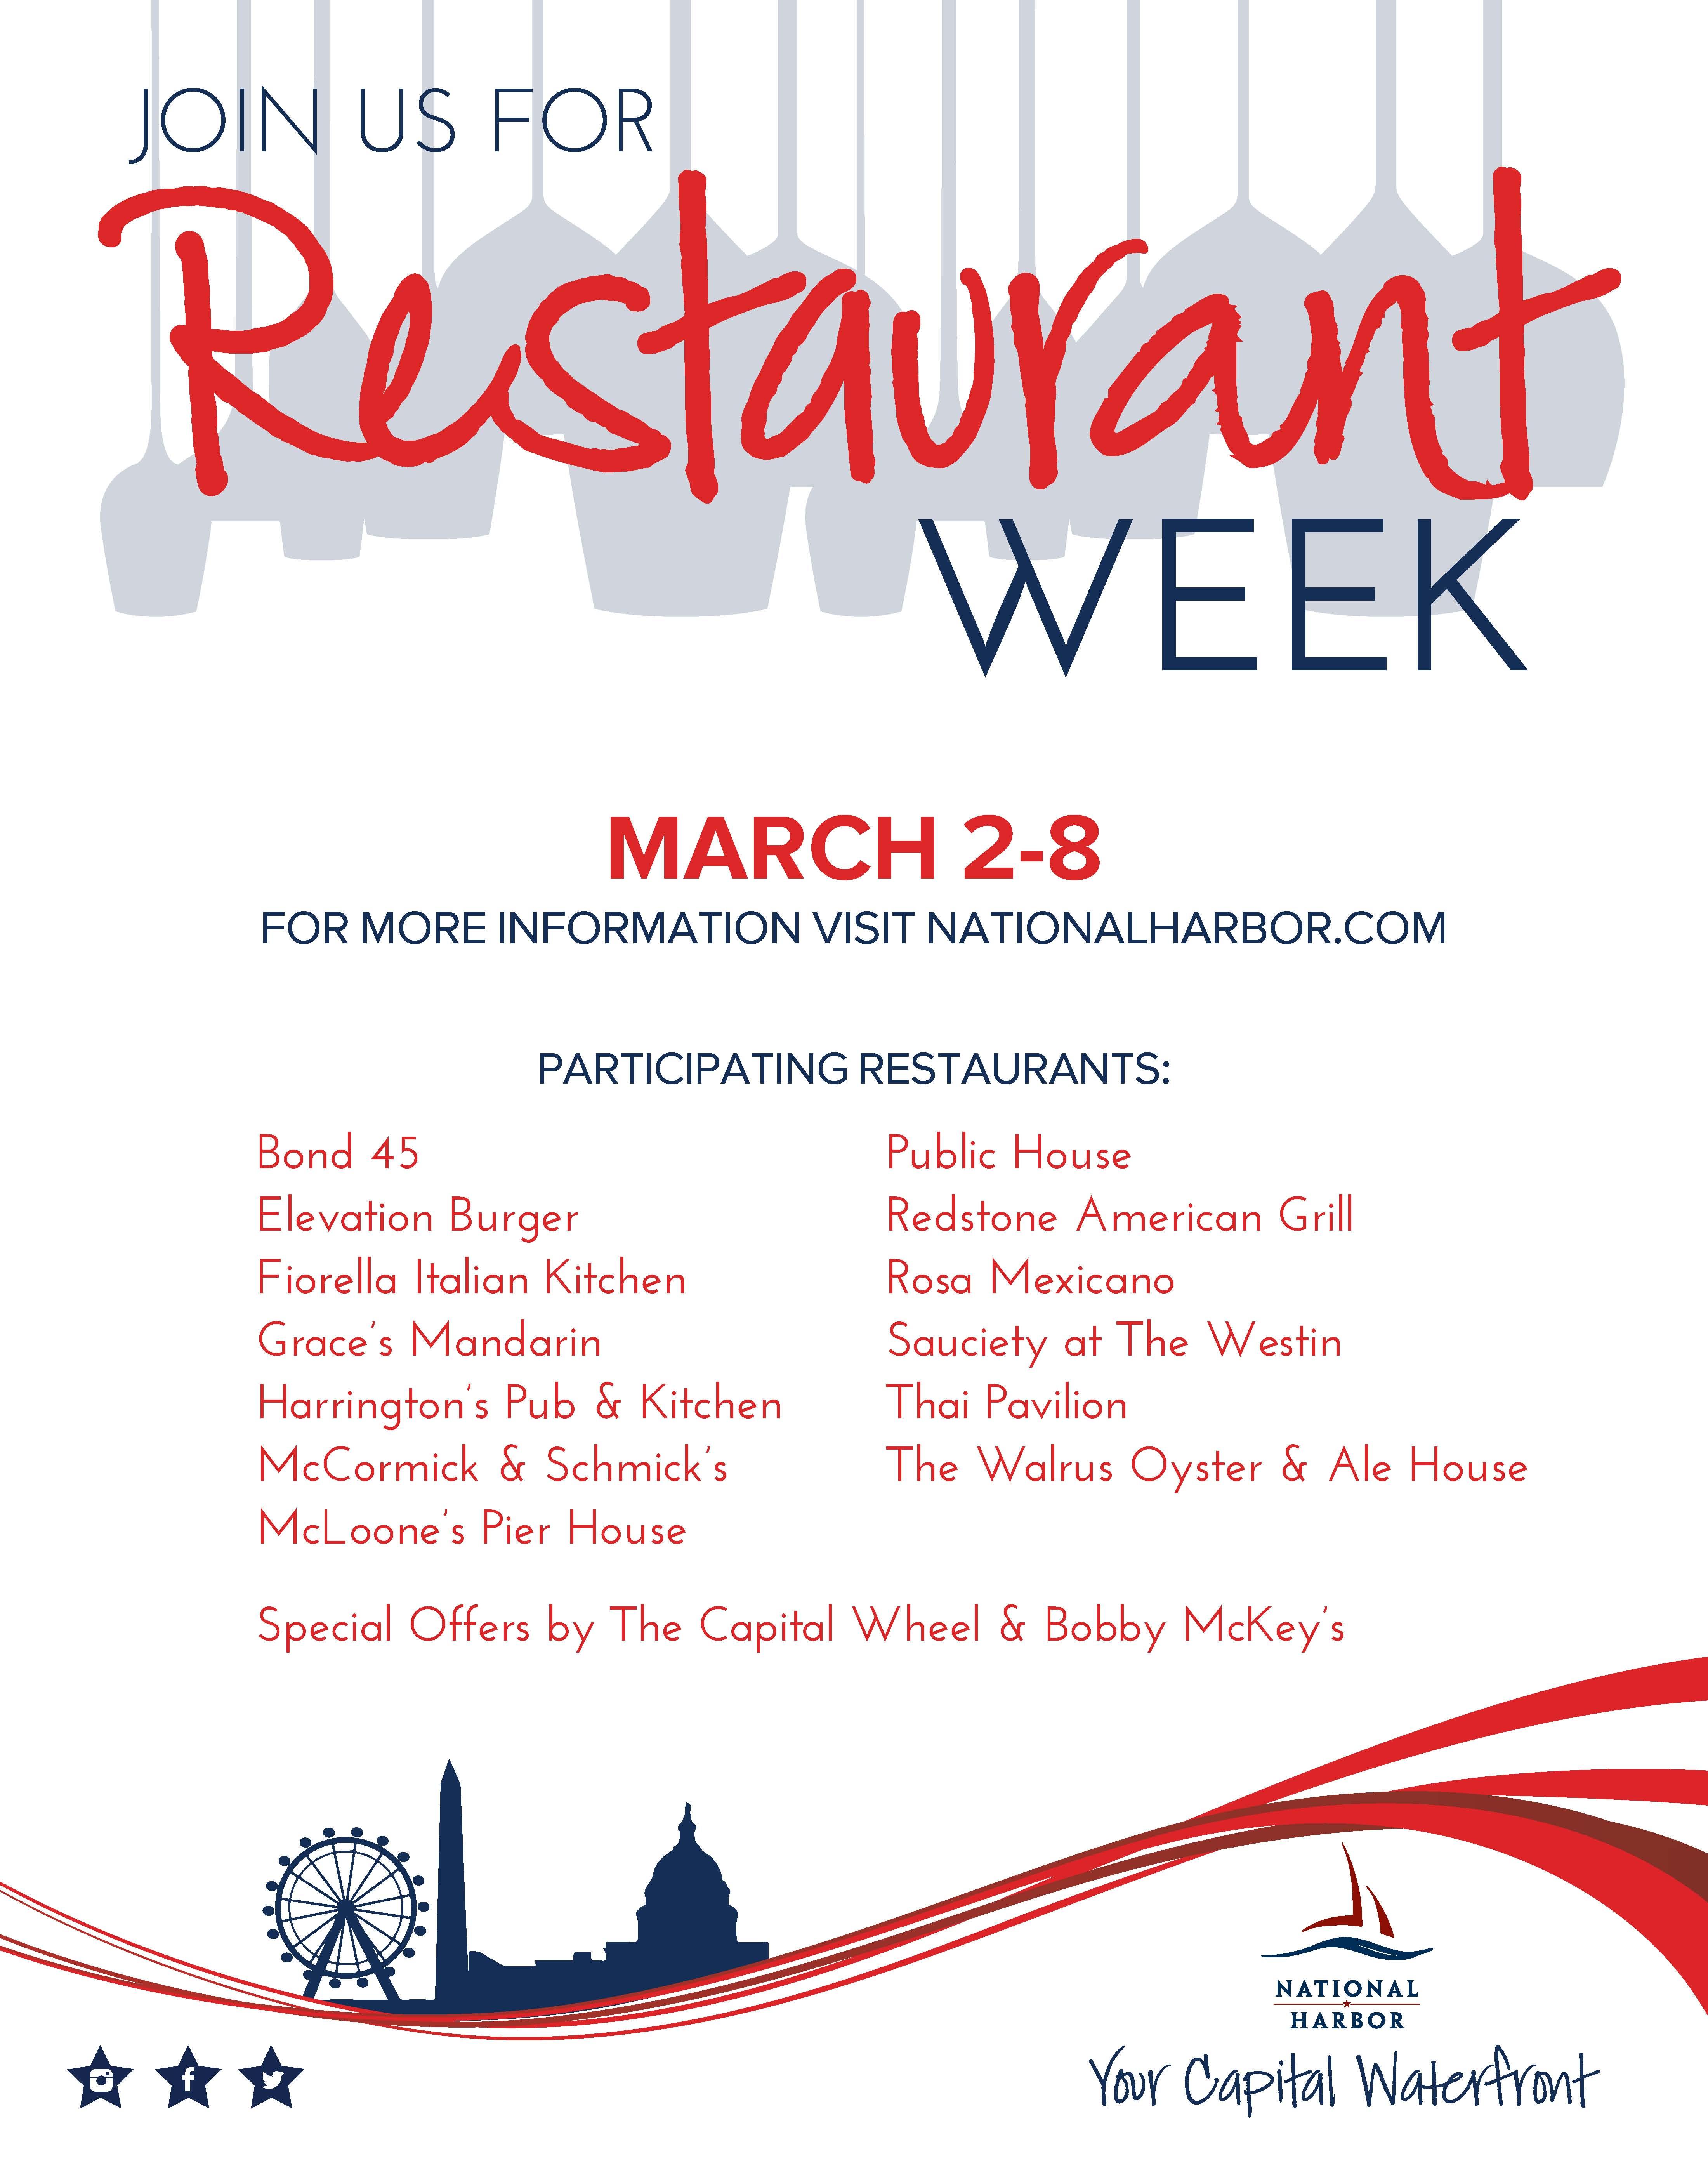 PG County Restaurant Week – ichoosecheverly